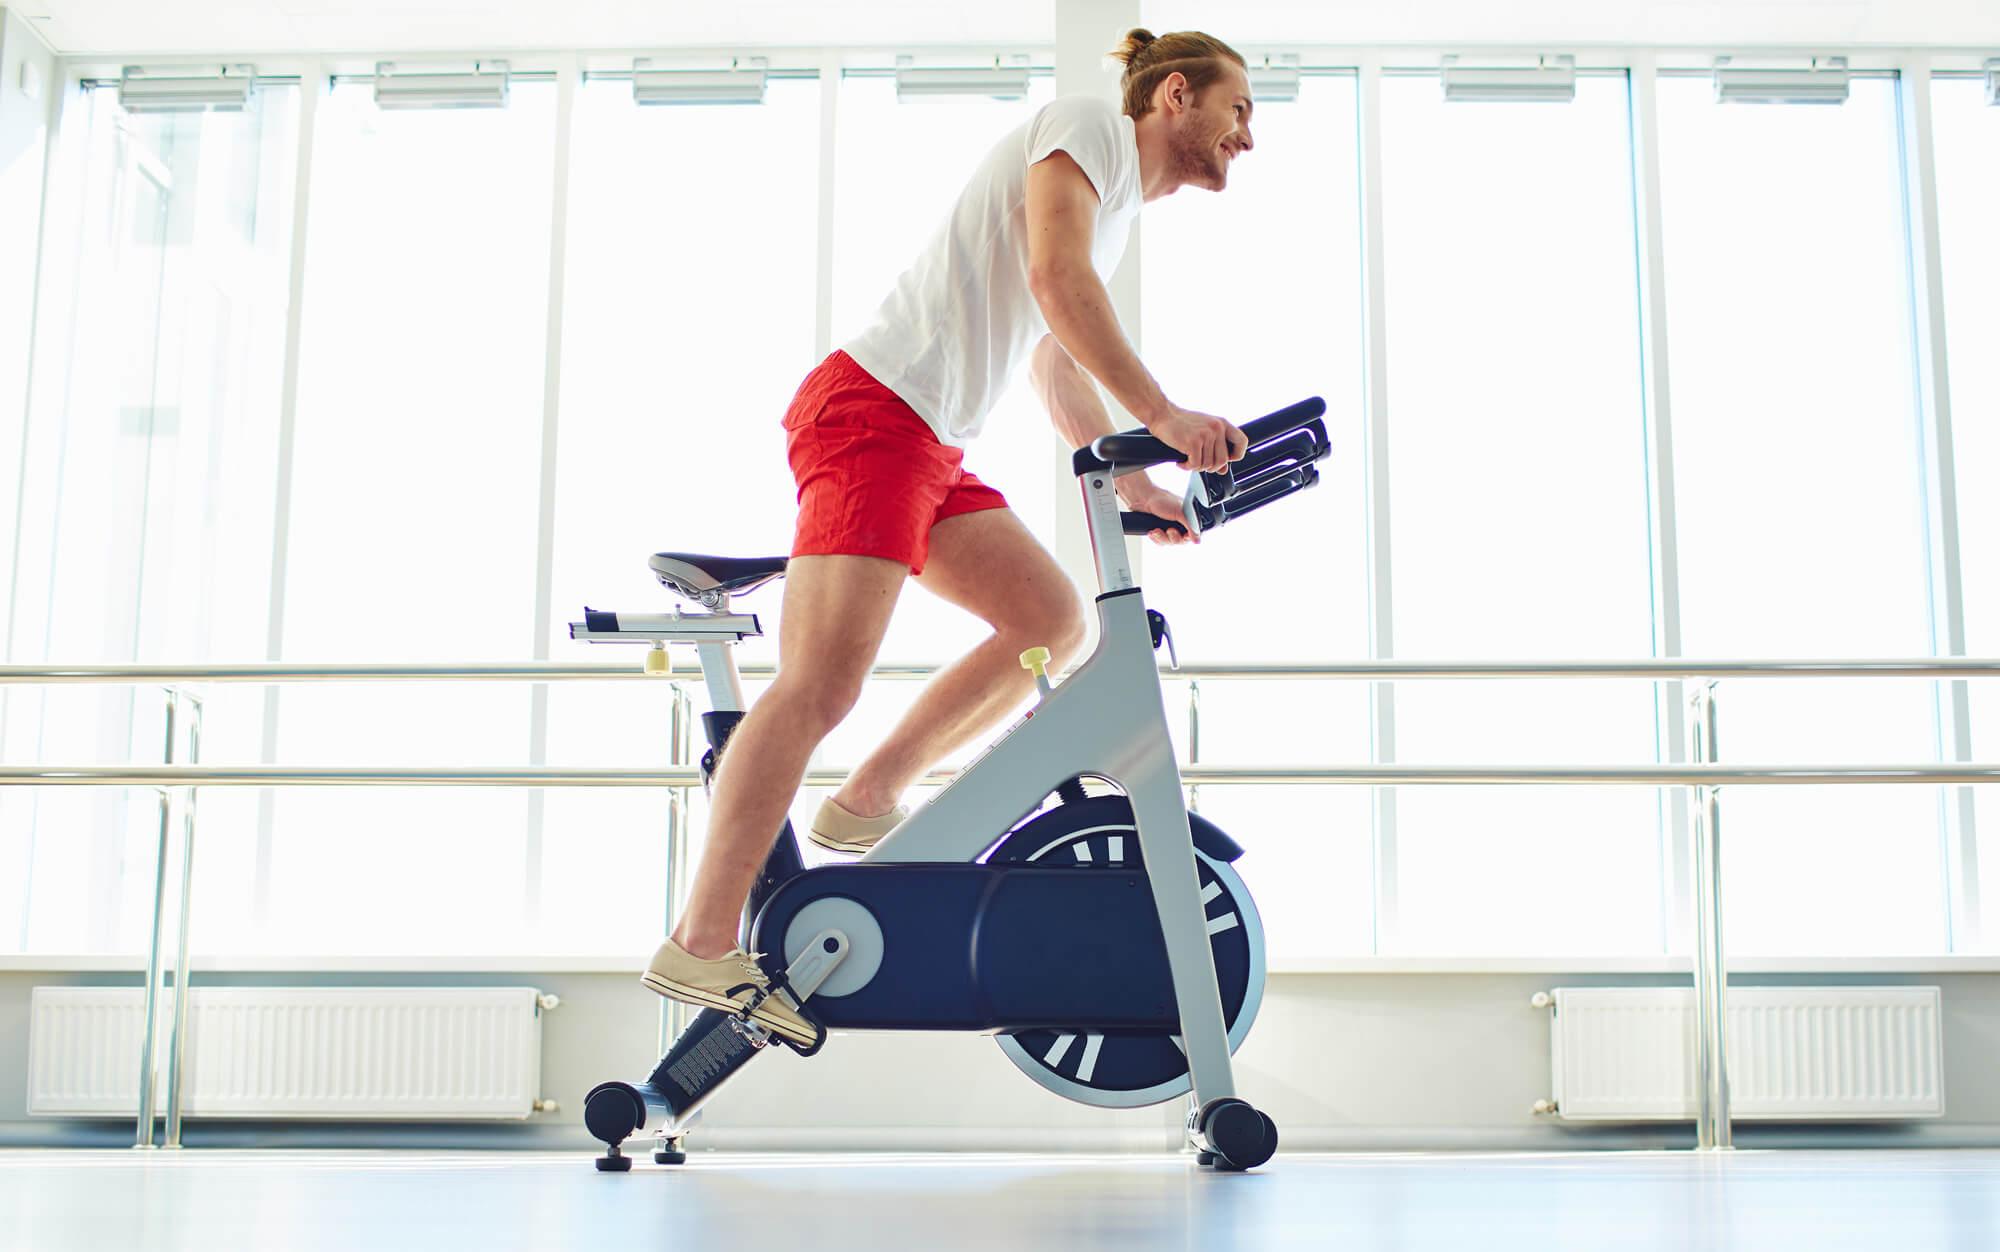 Ejercicios de rehabilitación de prótesis de rodilla con bicicleta estática